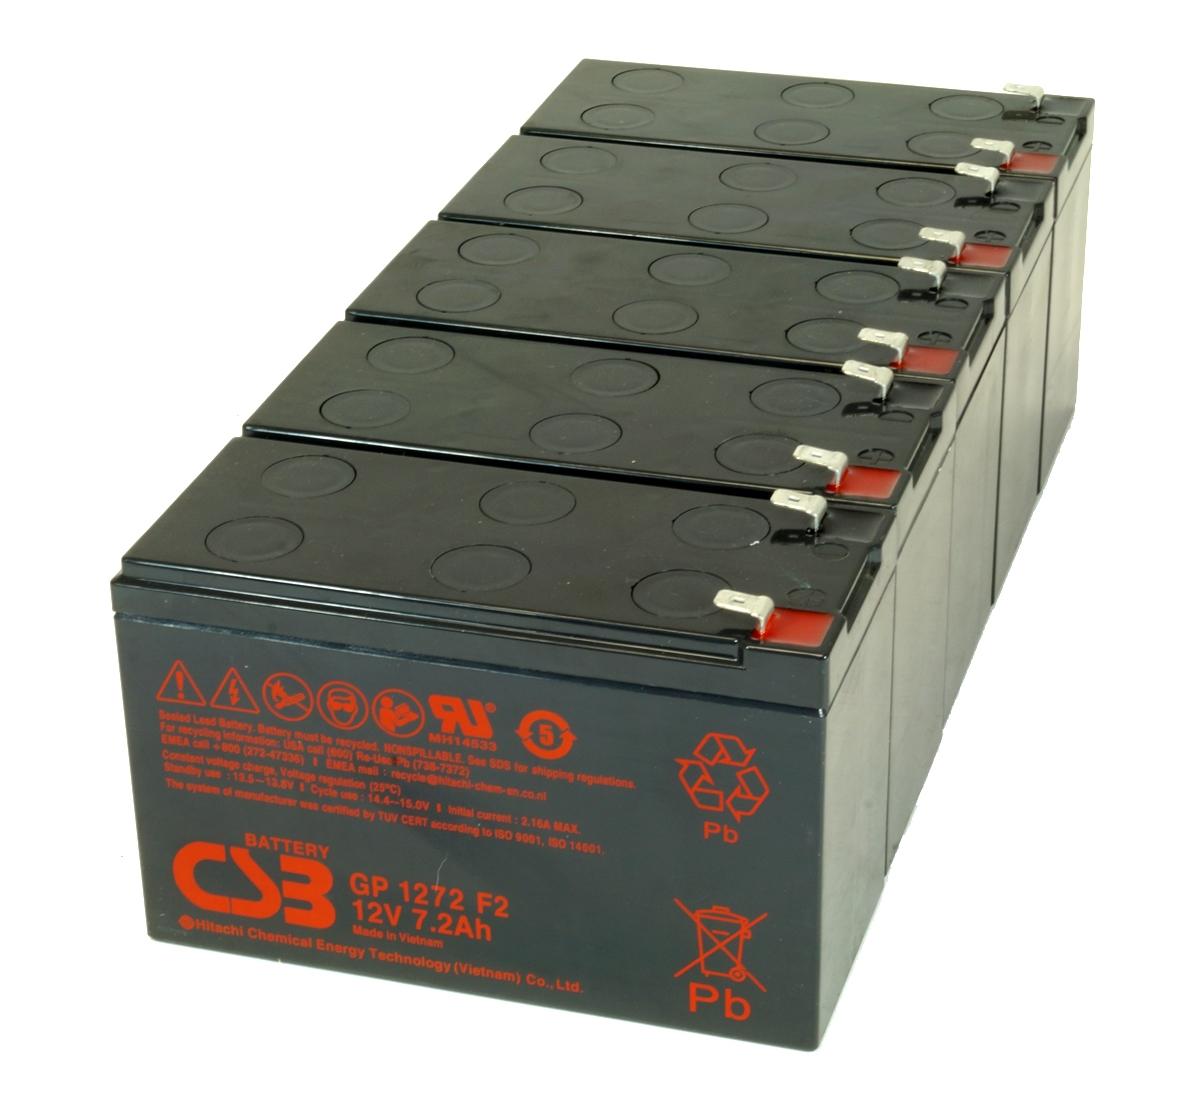 UPS vervangings batterij 5 x GP1272F2 CSB Battery